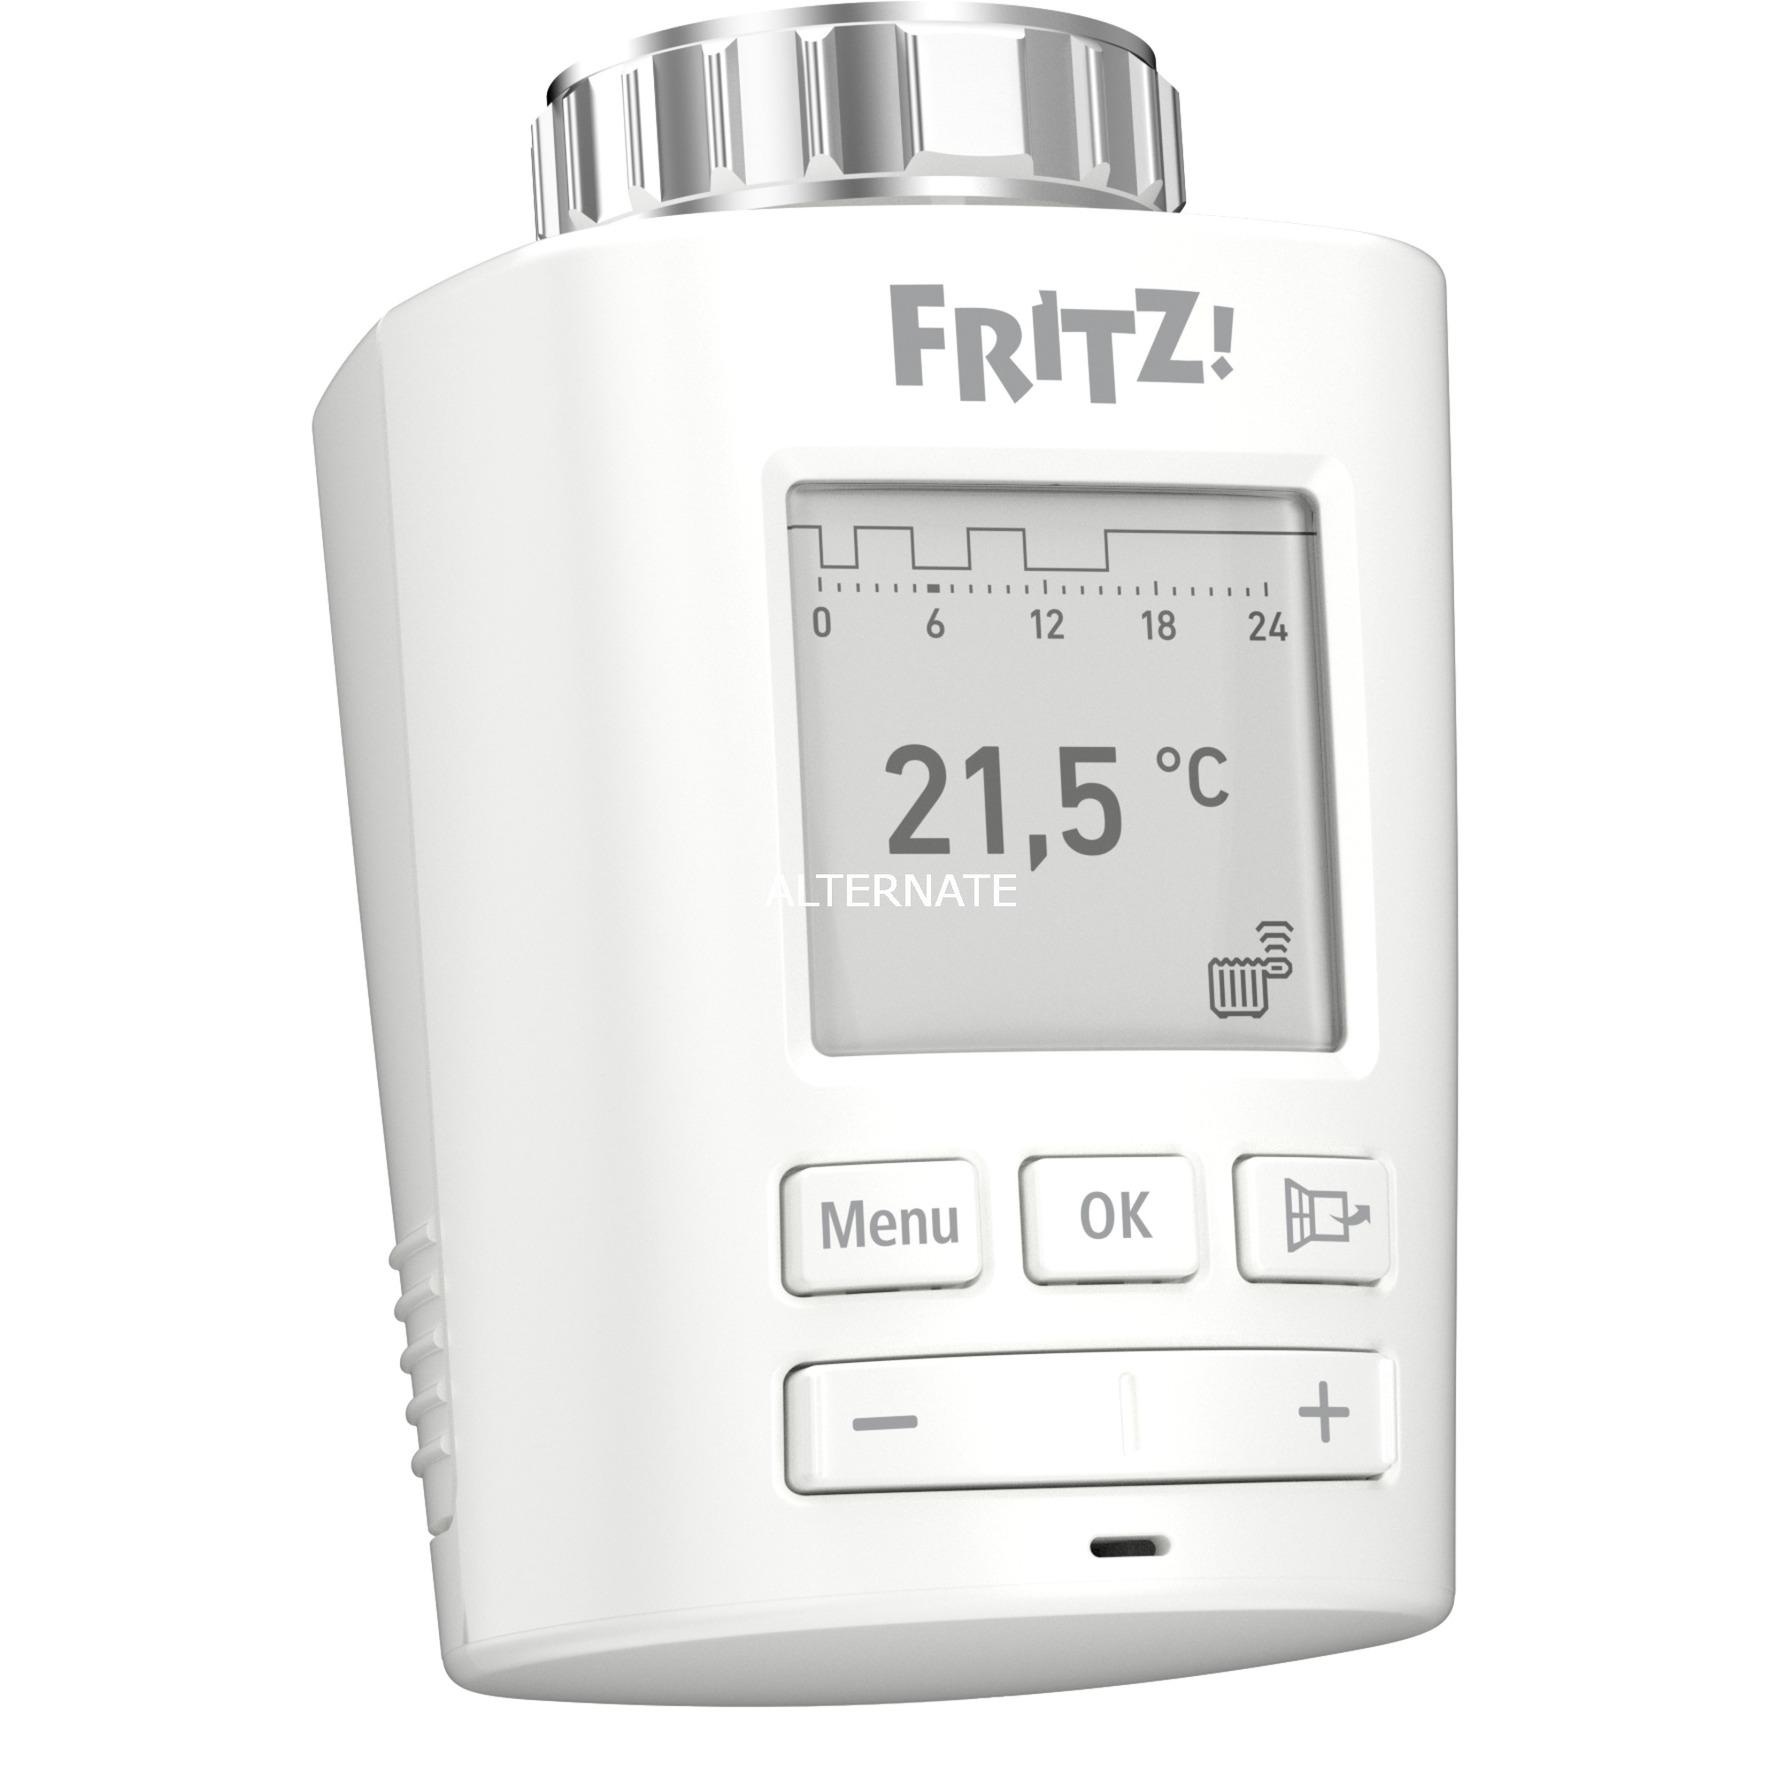 FRITZ!DECT 301 Blanco termoestato, Termostato